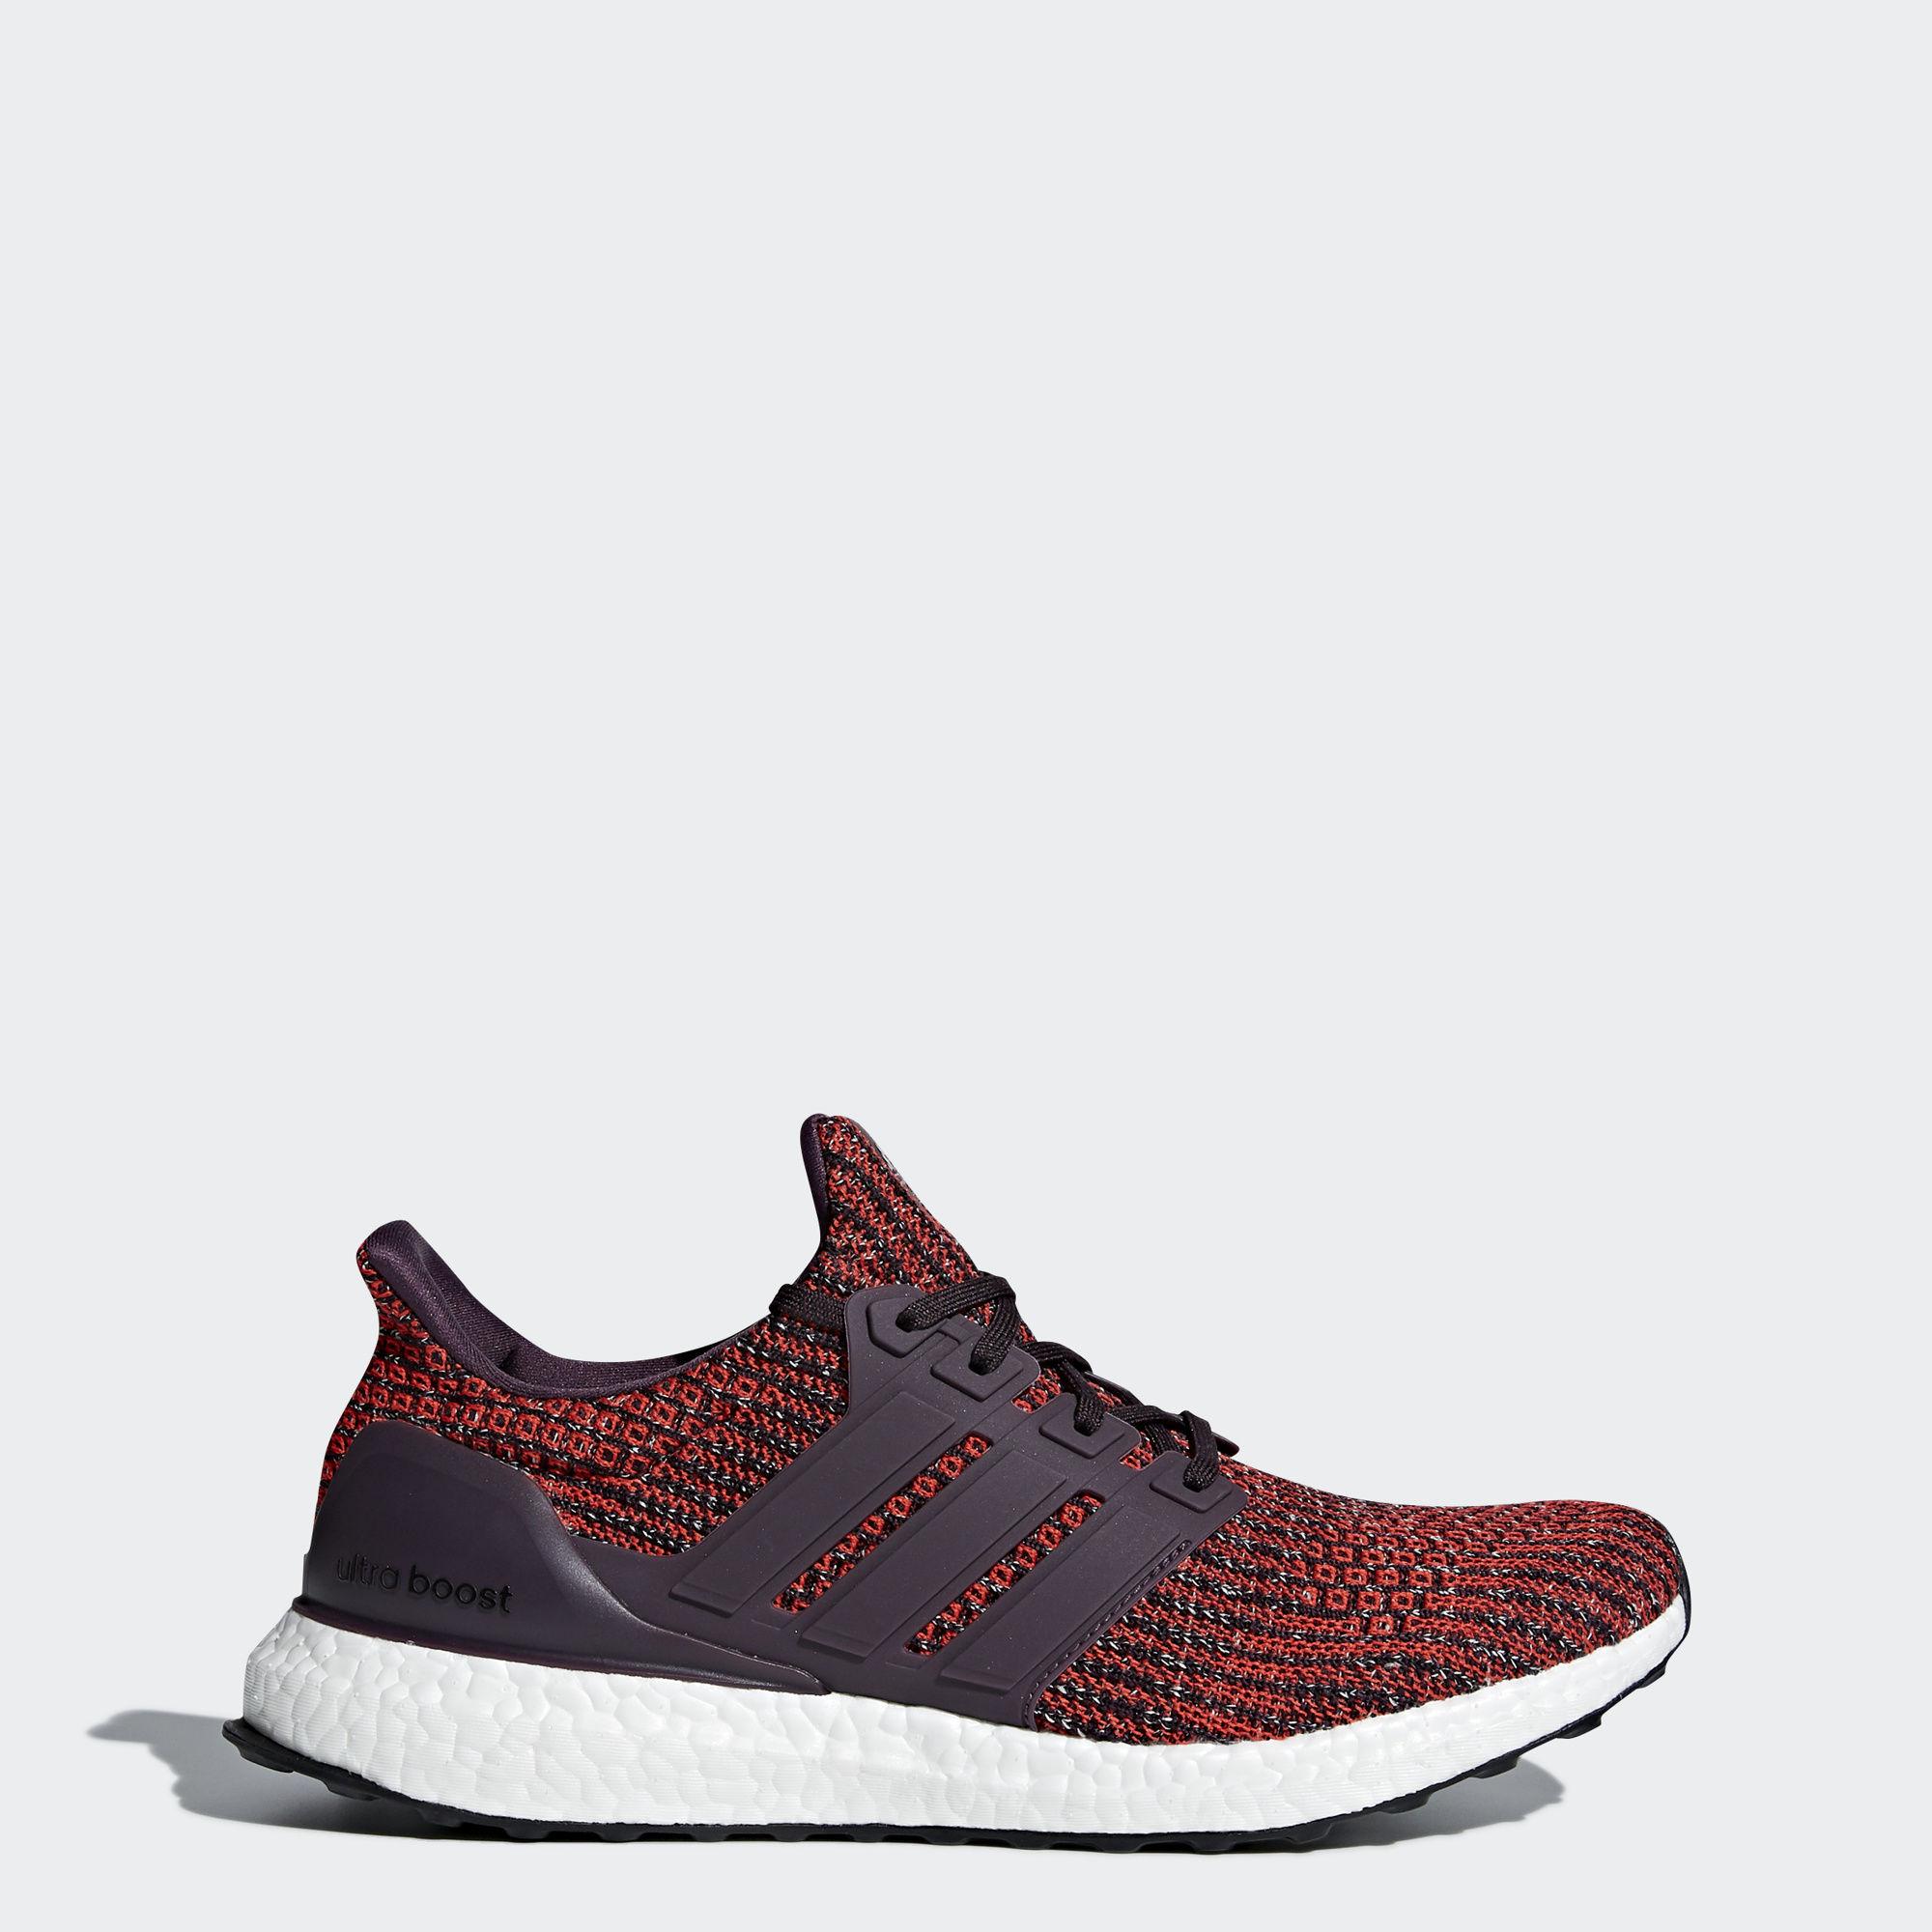 dacfdb244 Adidas extra 15% off on ebay. Men s 4.0 Ultraboost  84.14